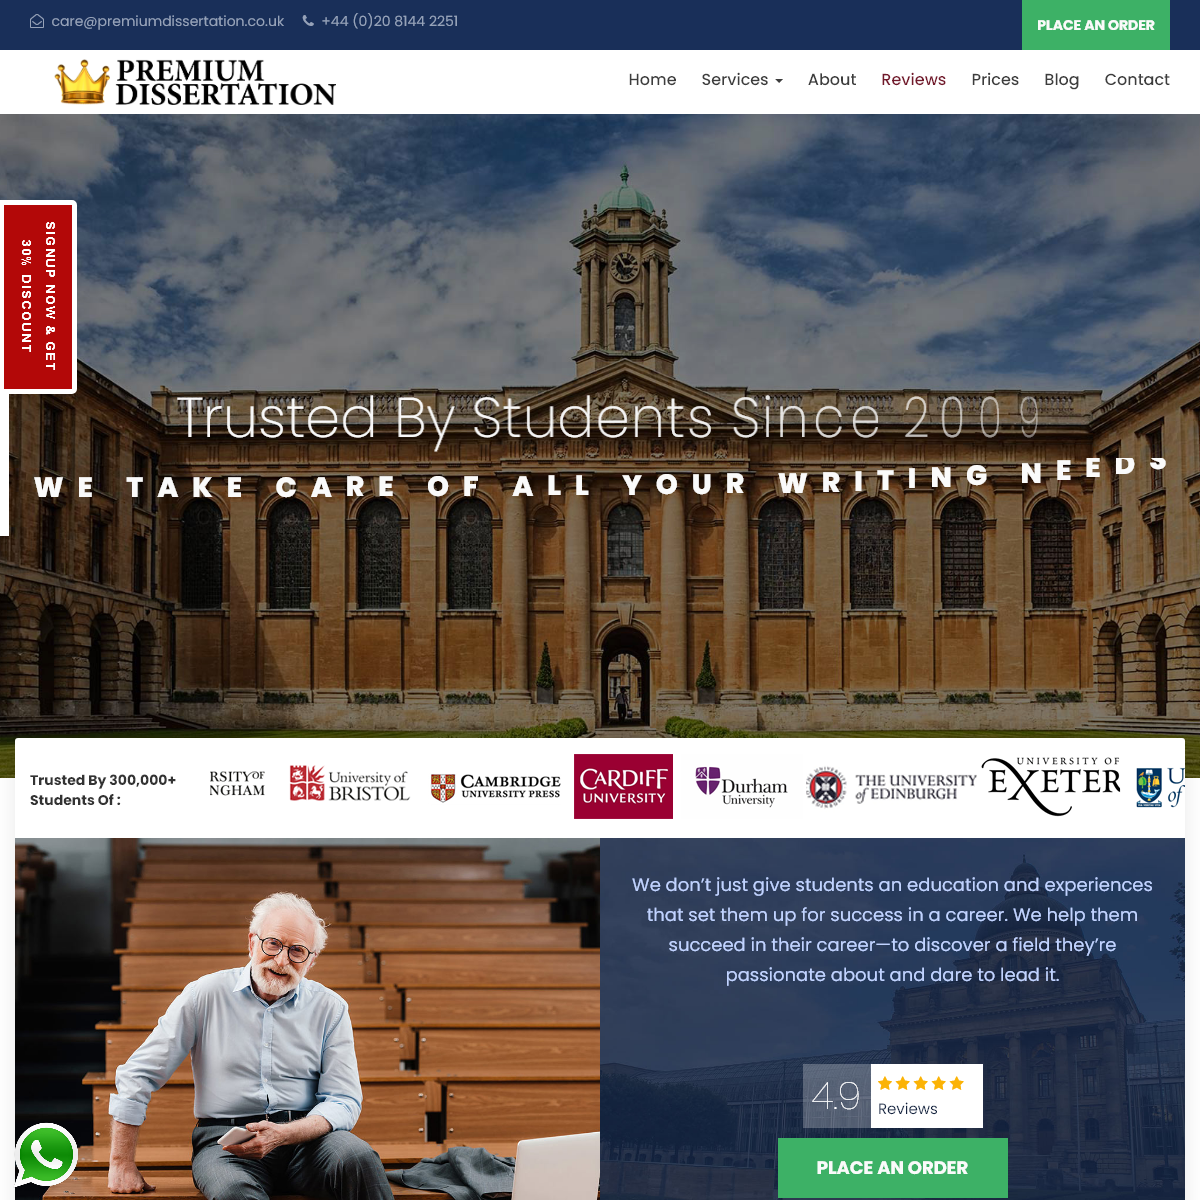 Best Dissertation Writing Services UK - Premium Dissertation